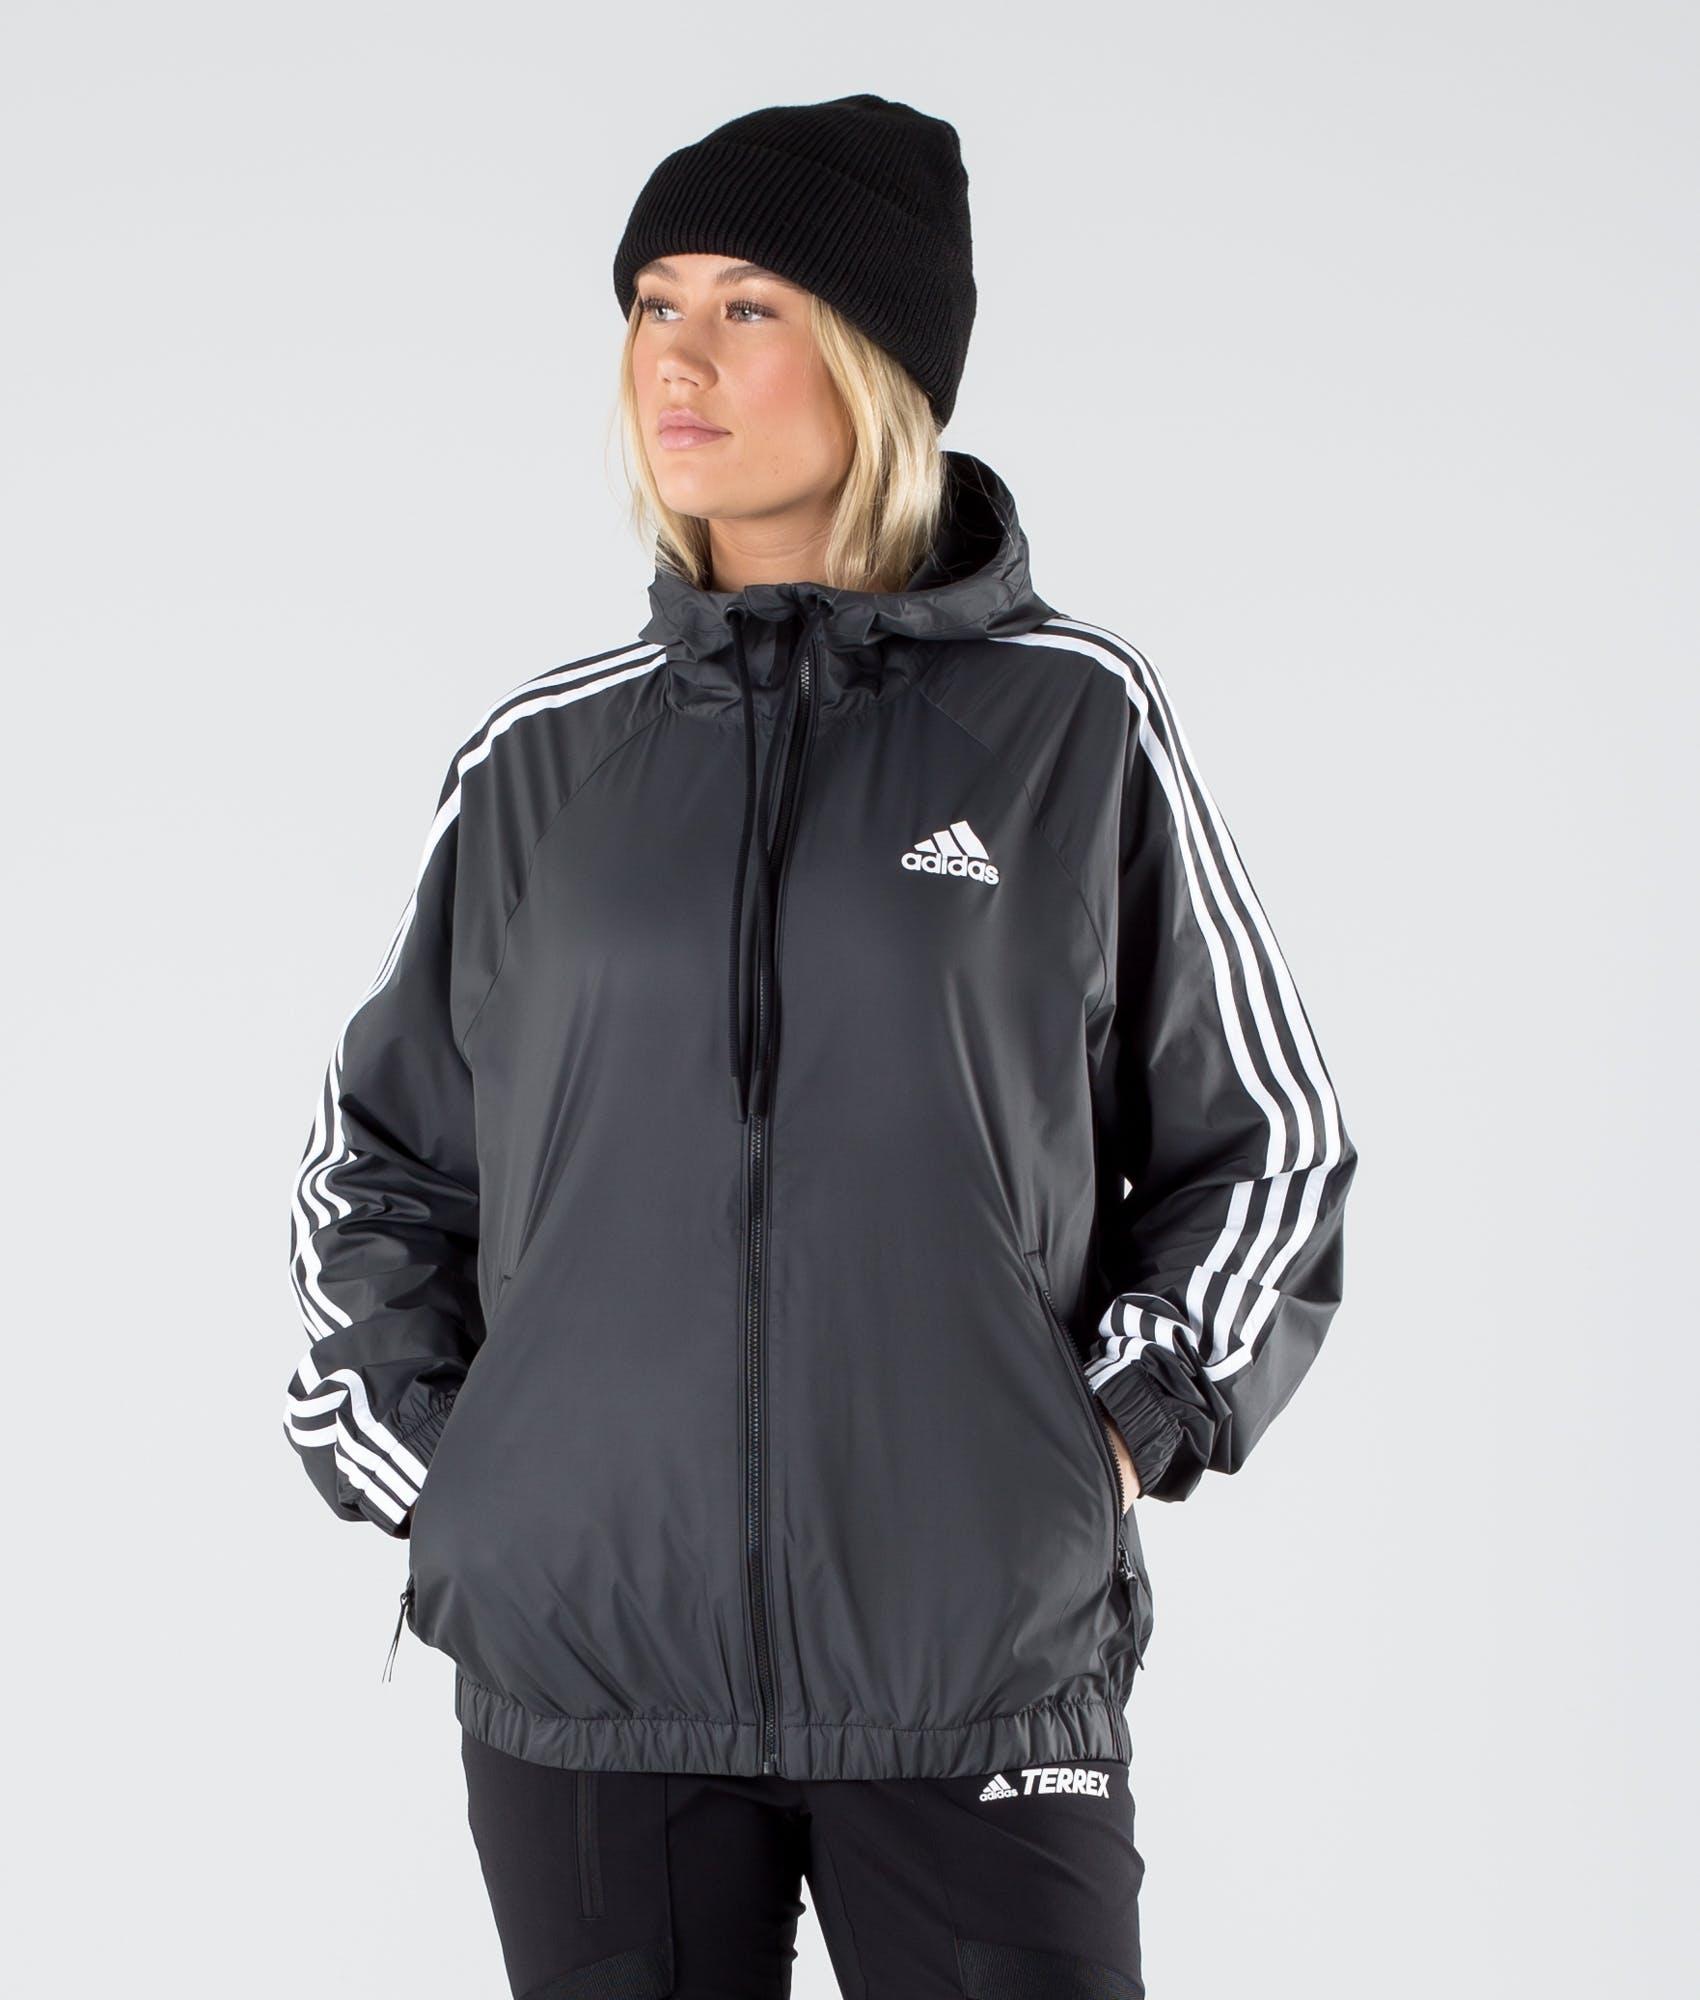 Adidas Terrex BSC Stripes